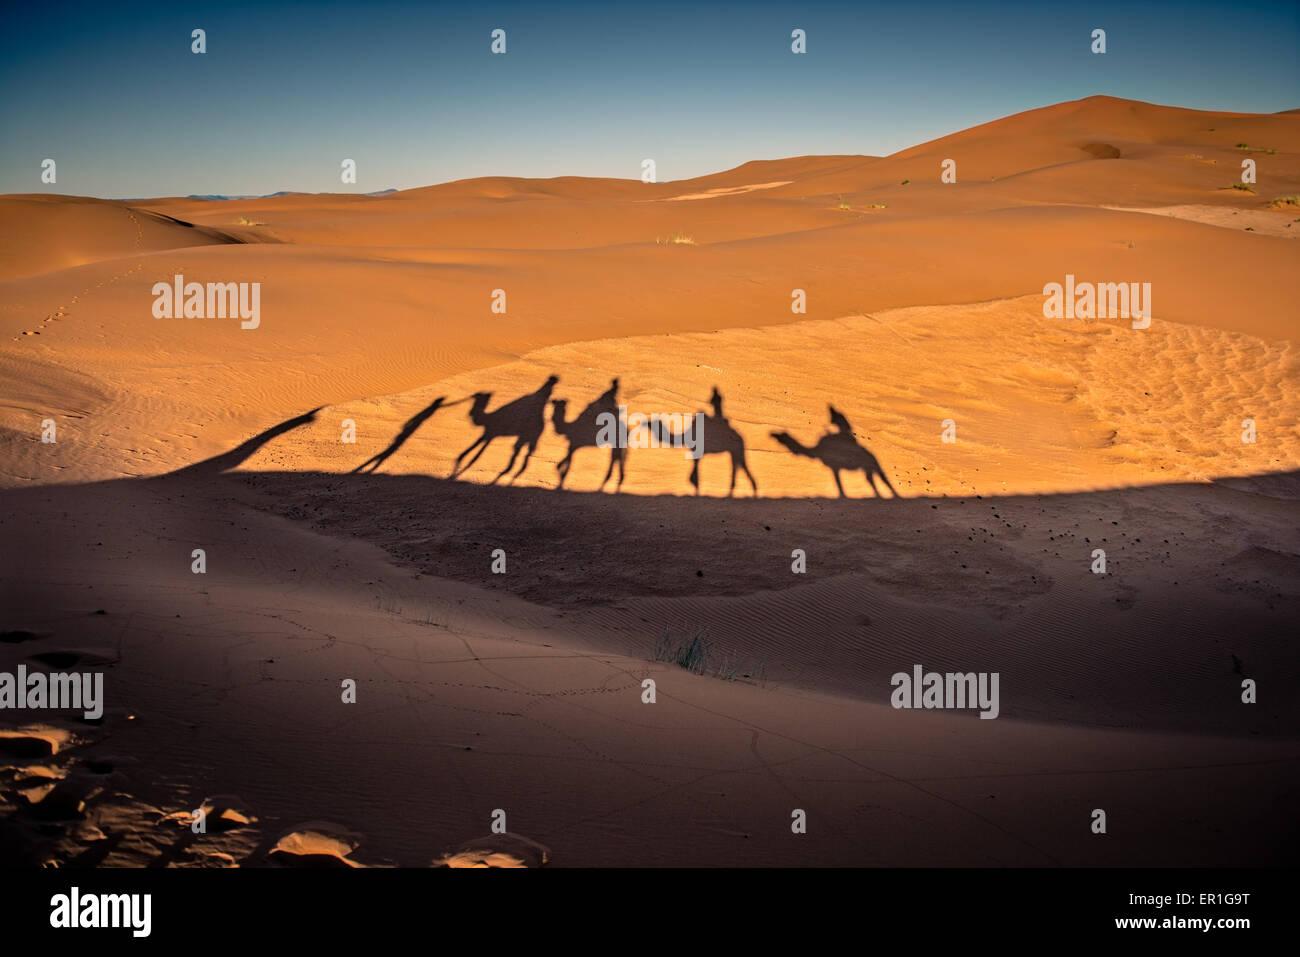 Long shadows of camel caravan walking in the desert of Sahara, south Morocco - Stock Image